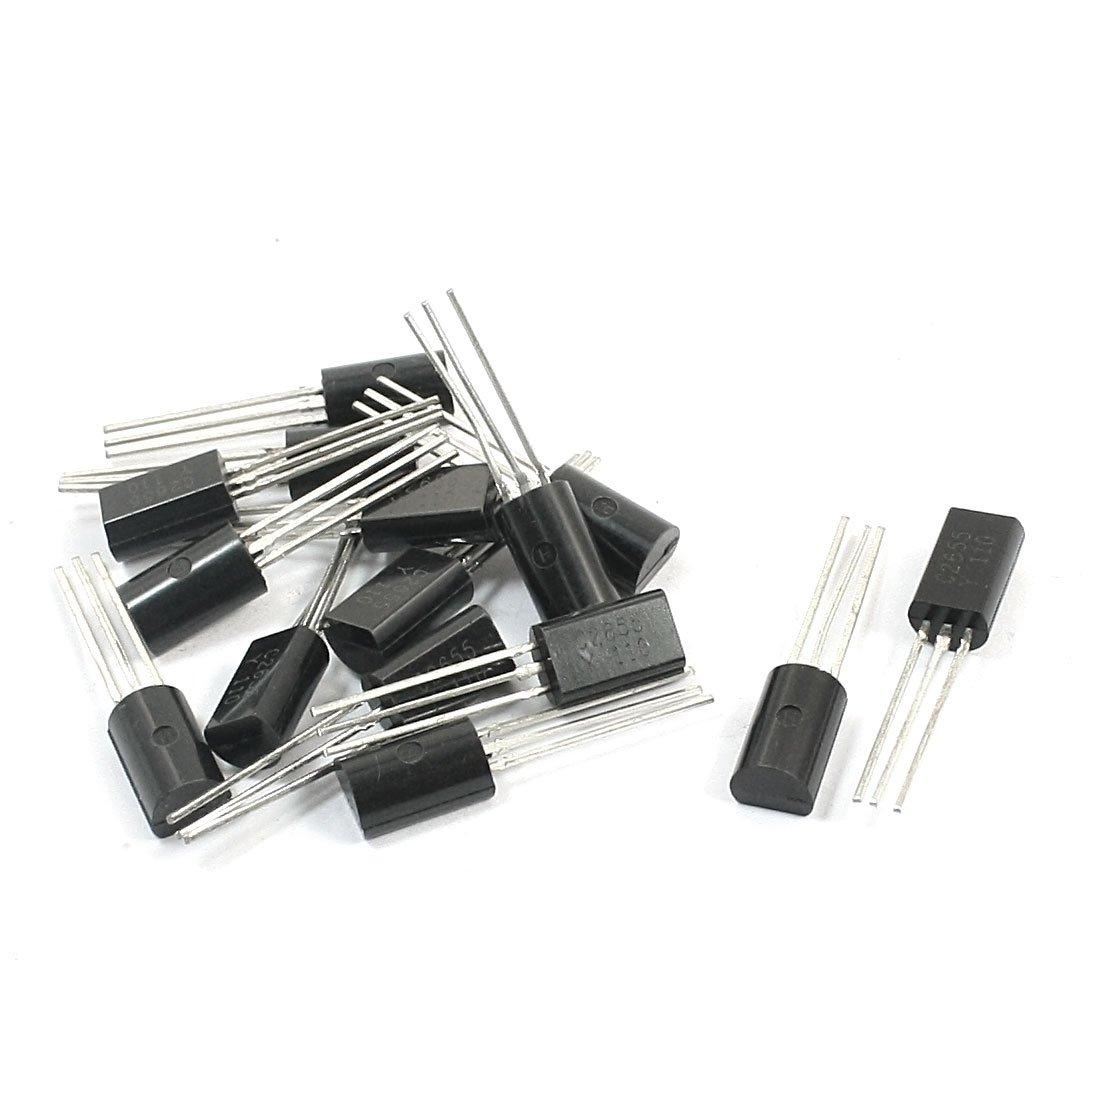 Aexit 15Pcs 2SC2655 Transistors NPN PCB Surface Mount General Purpose Transistor MOSFET Transistors 50V 2A